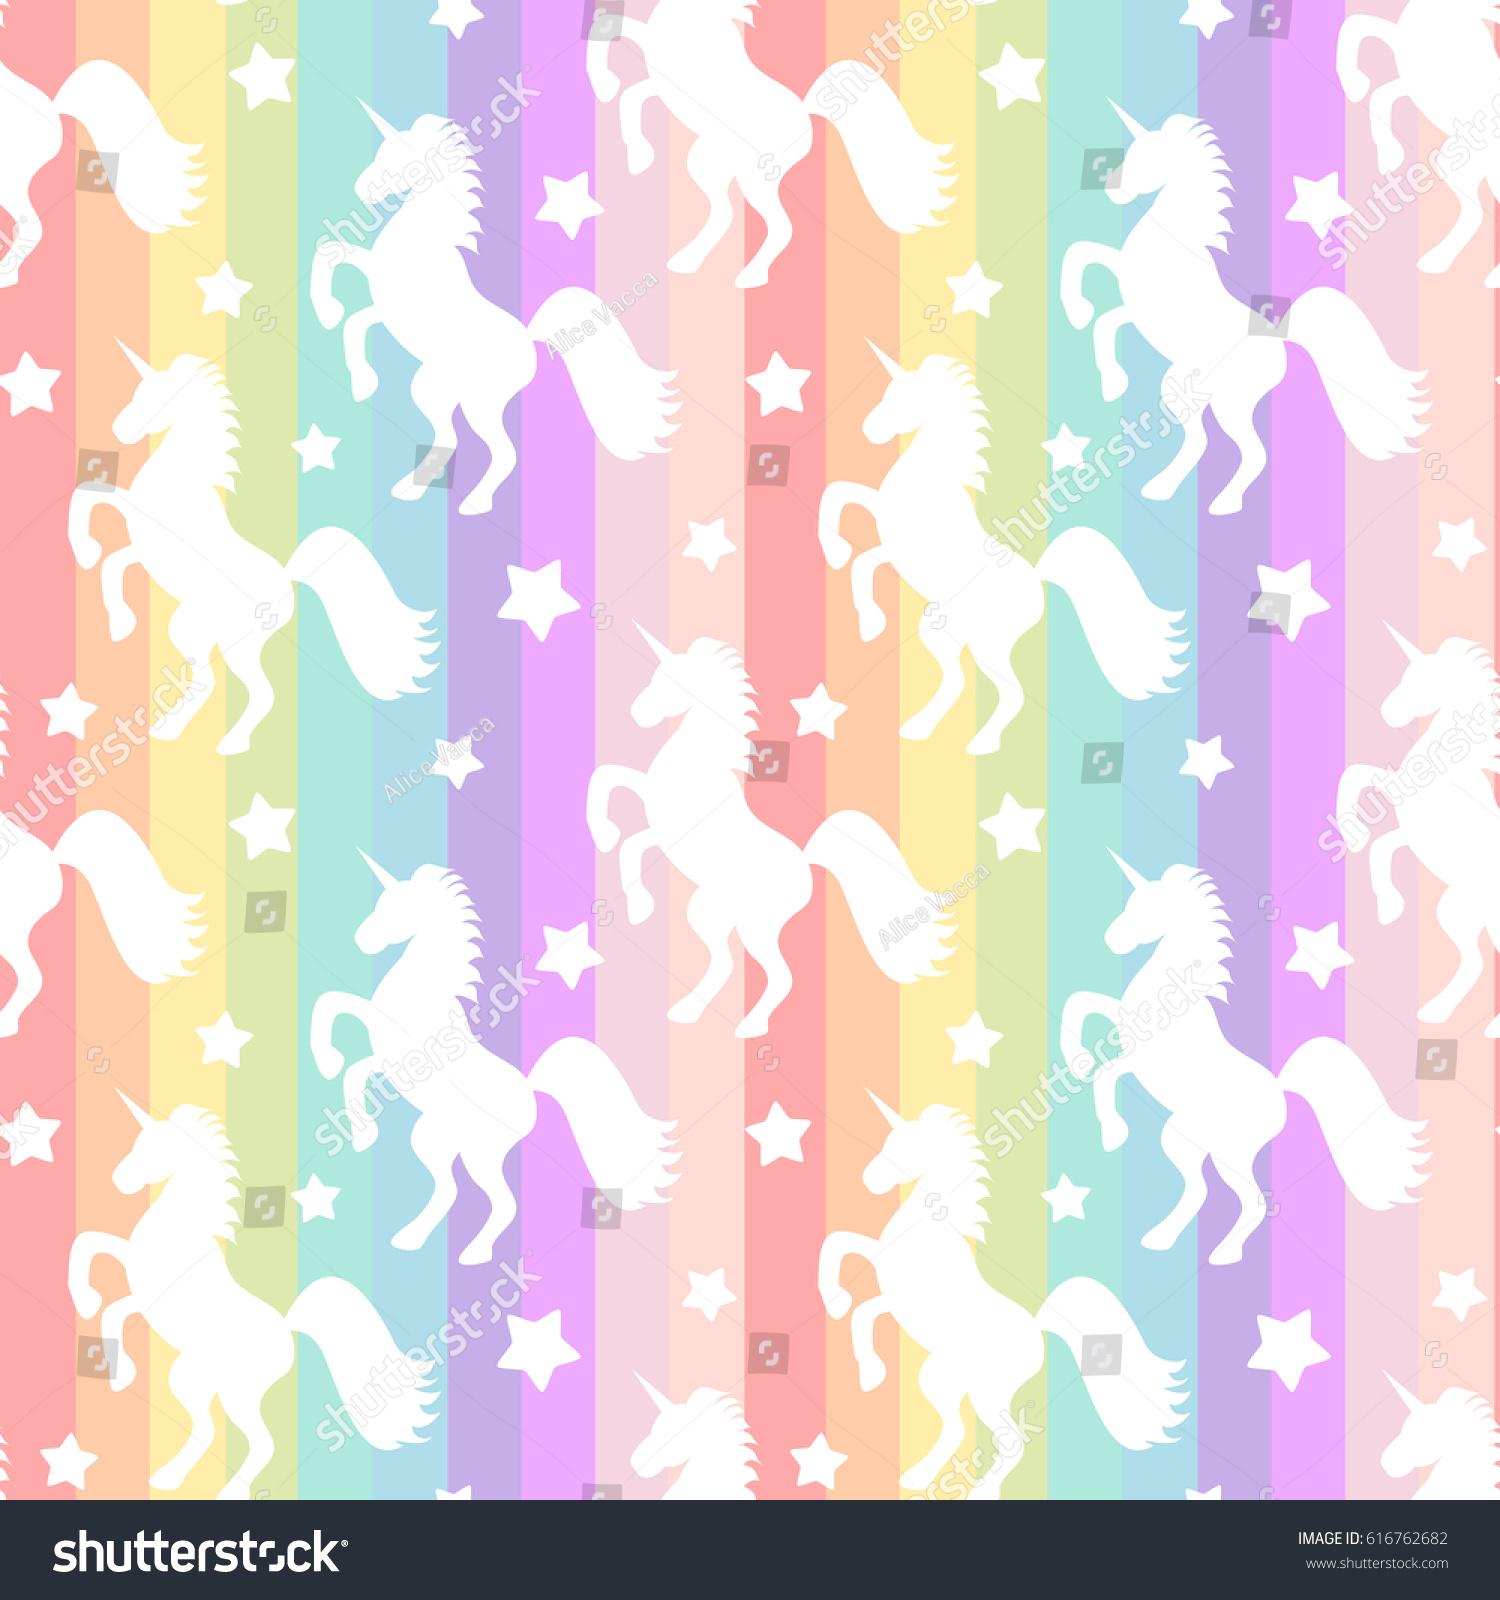 Cute Cartoon Fairy Wallpaper Cute White Unicorns Silhouette On Rainbow Stock Vector